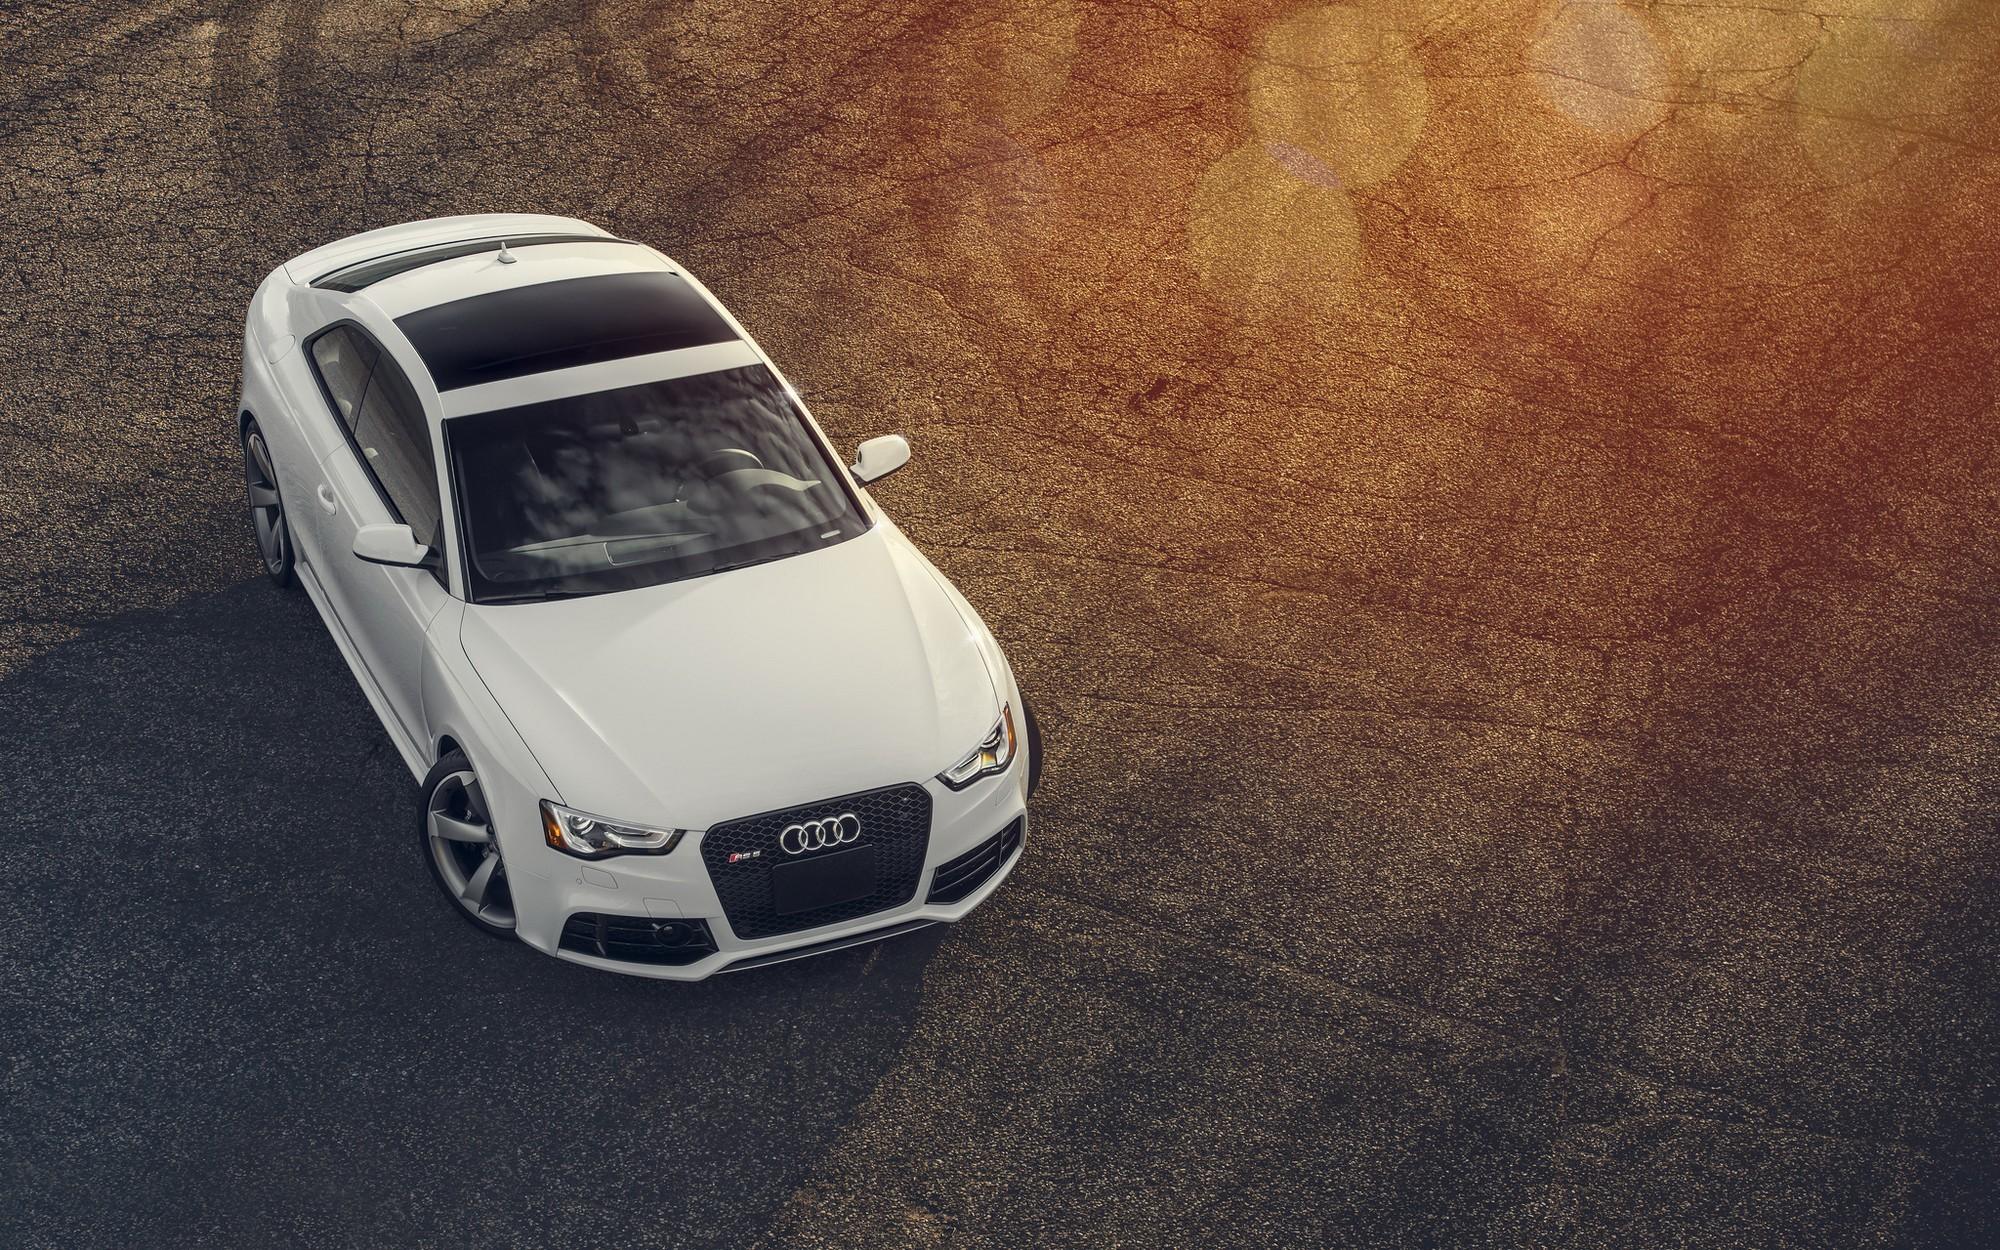 Wallpaper 2000x1250 Px Audi Rs5 2000x1250